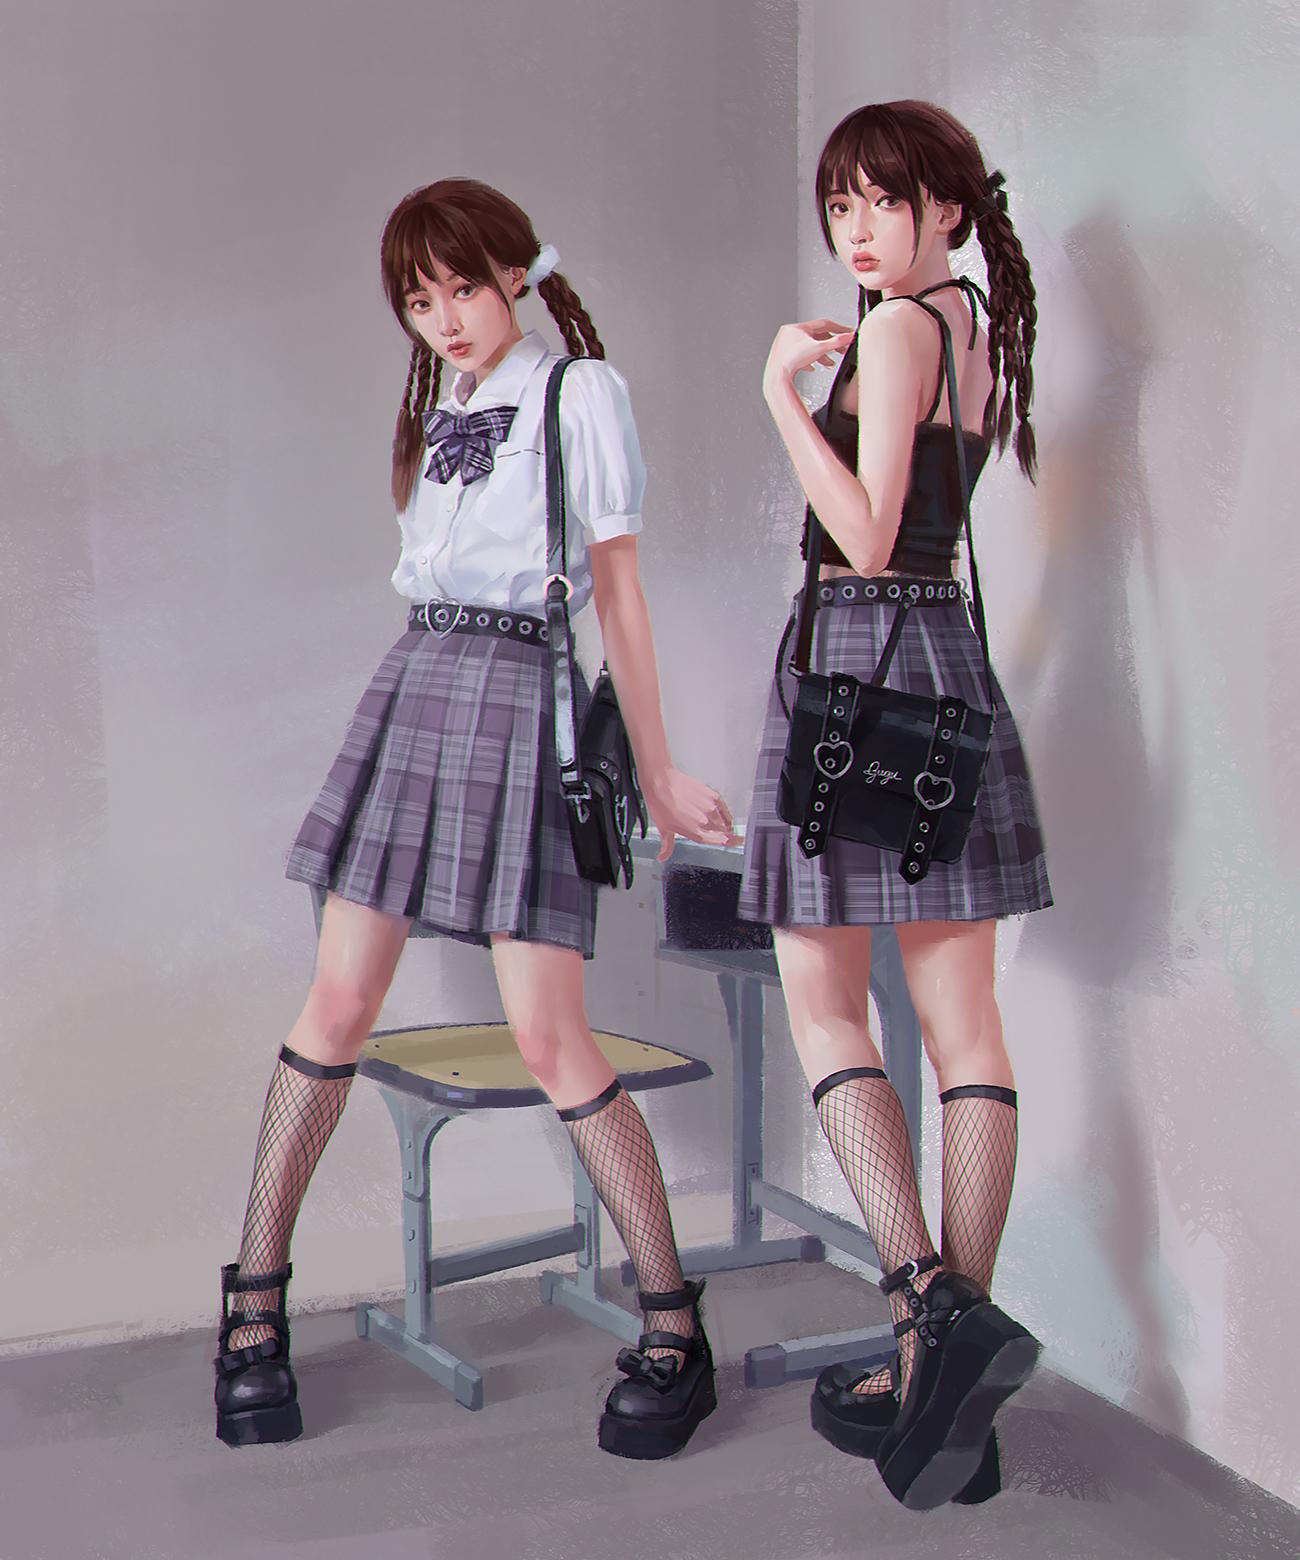 General 1300x1560 fishnet stockings Asian women vertical school uniform